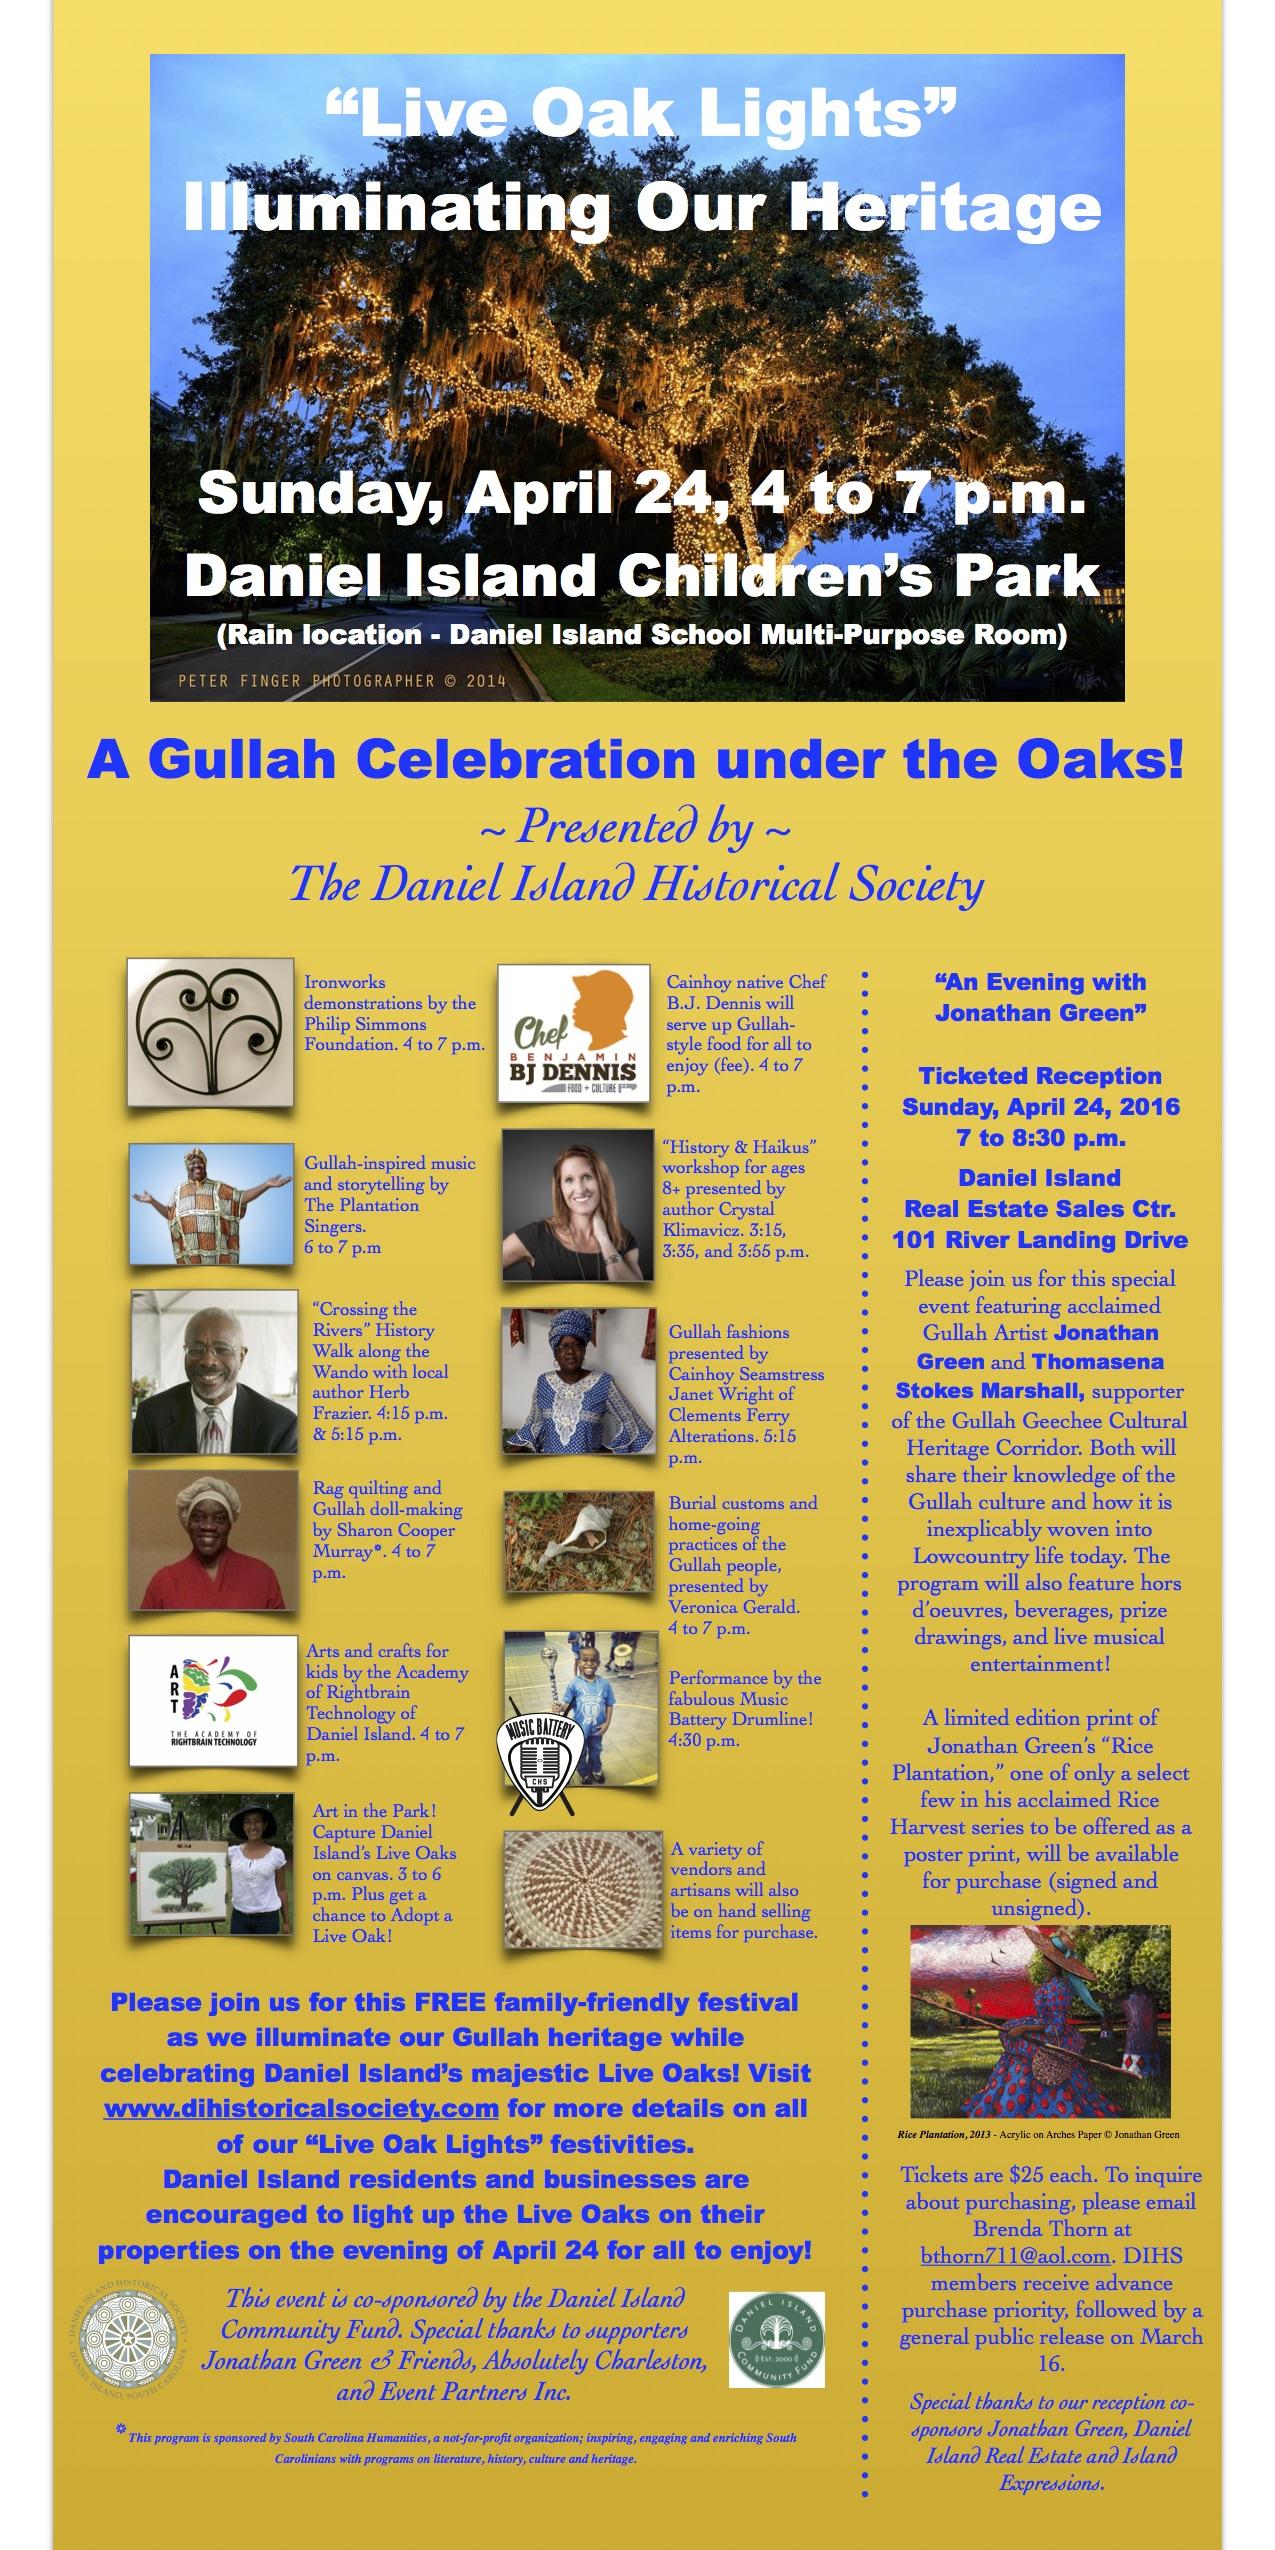 Live Oak Lights: Illuminating Our Heritage – A Gullah